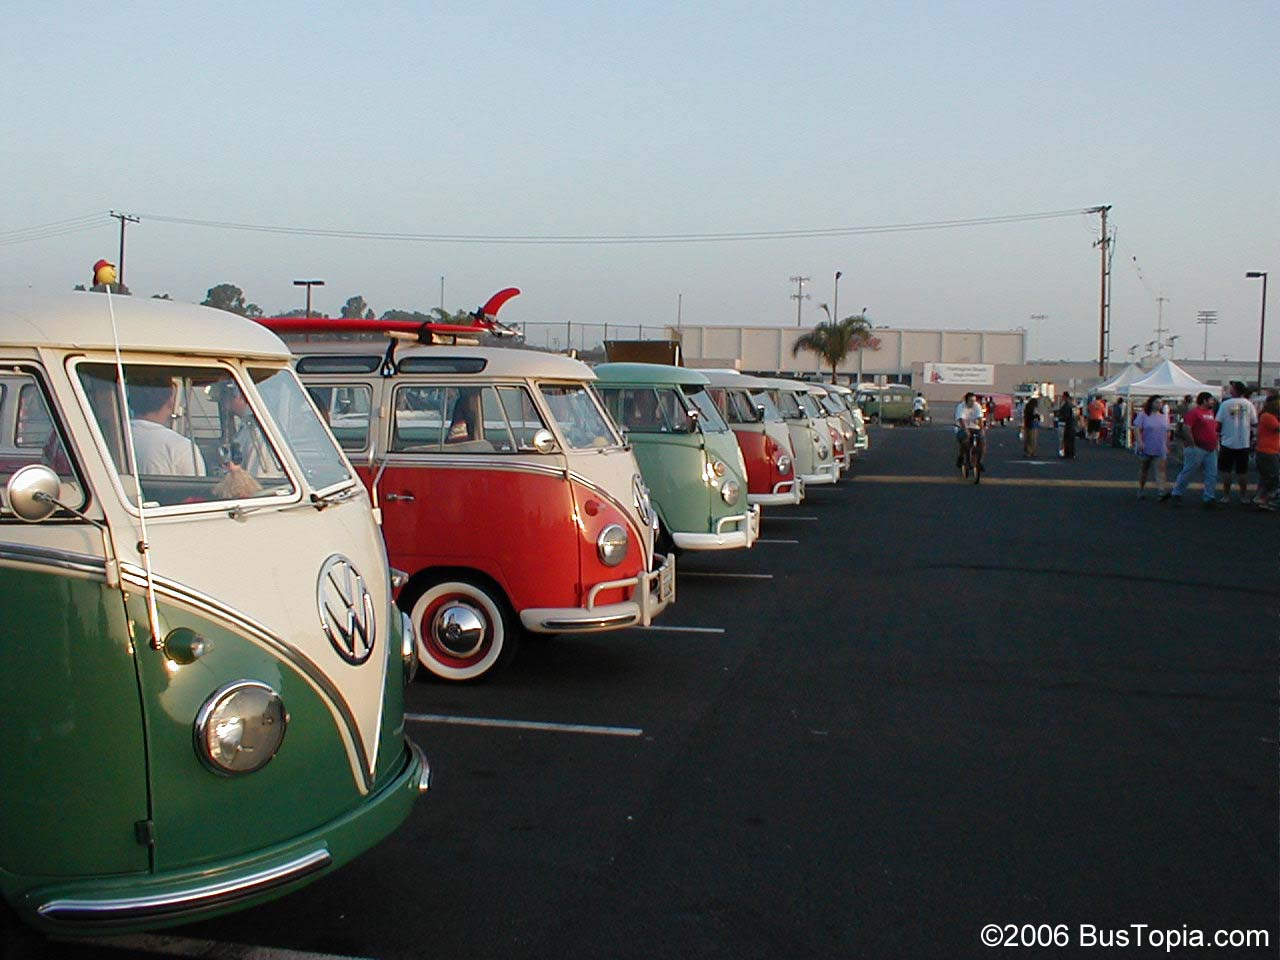 Volkswagen Car Show Swap Meet And Miscellaneous Images From - Volkswagen car show